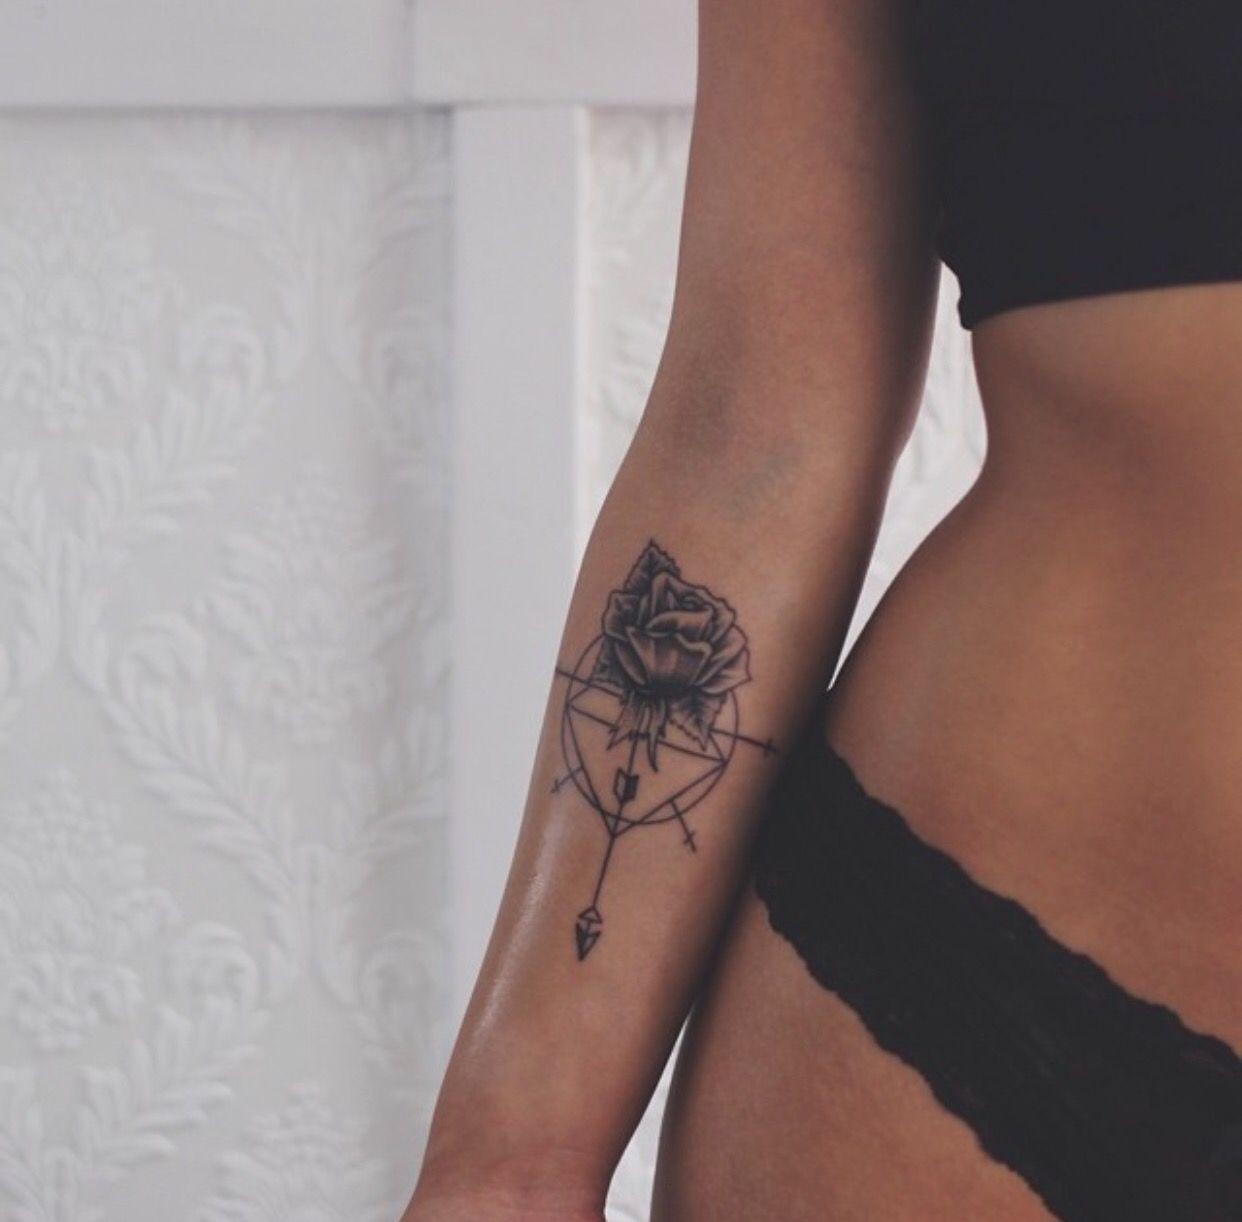 Tattoo Rose Arrow Underarm Arm Bliss Pinte regarding measurements 1242 X 1222